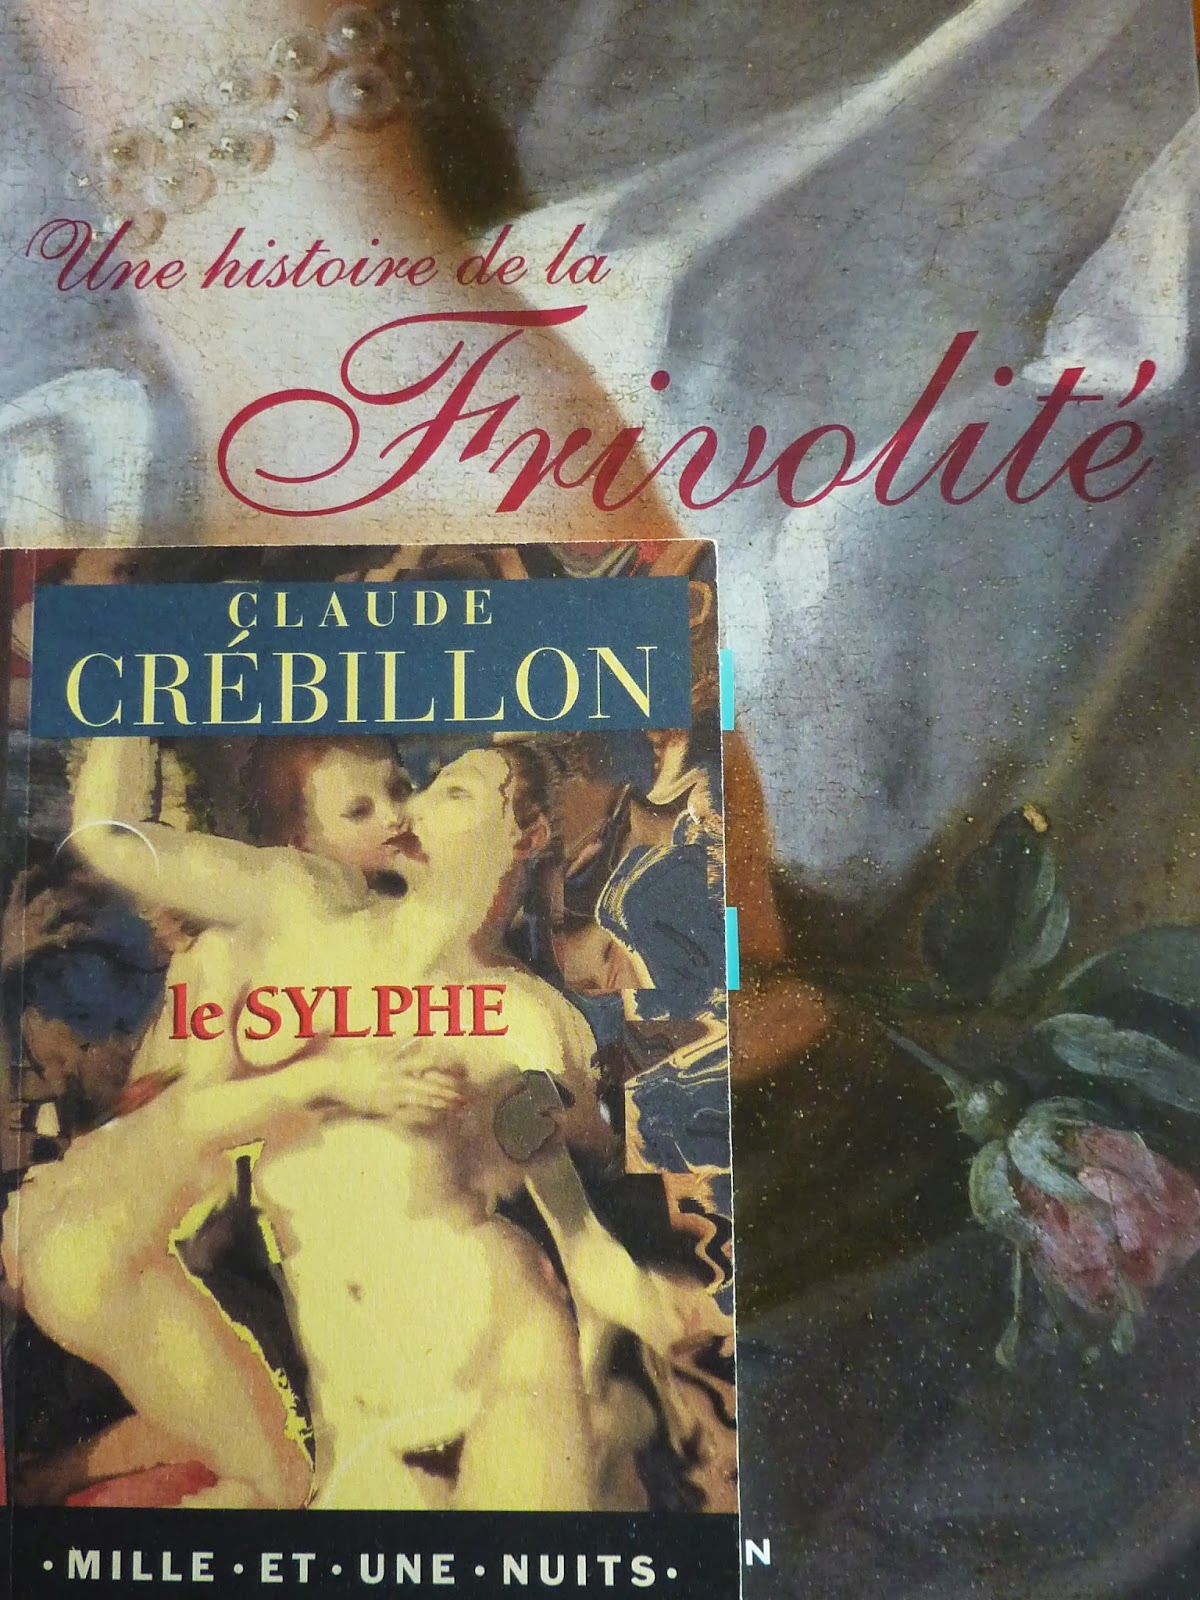 Le sylphe - Crébillon fils